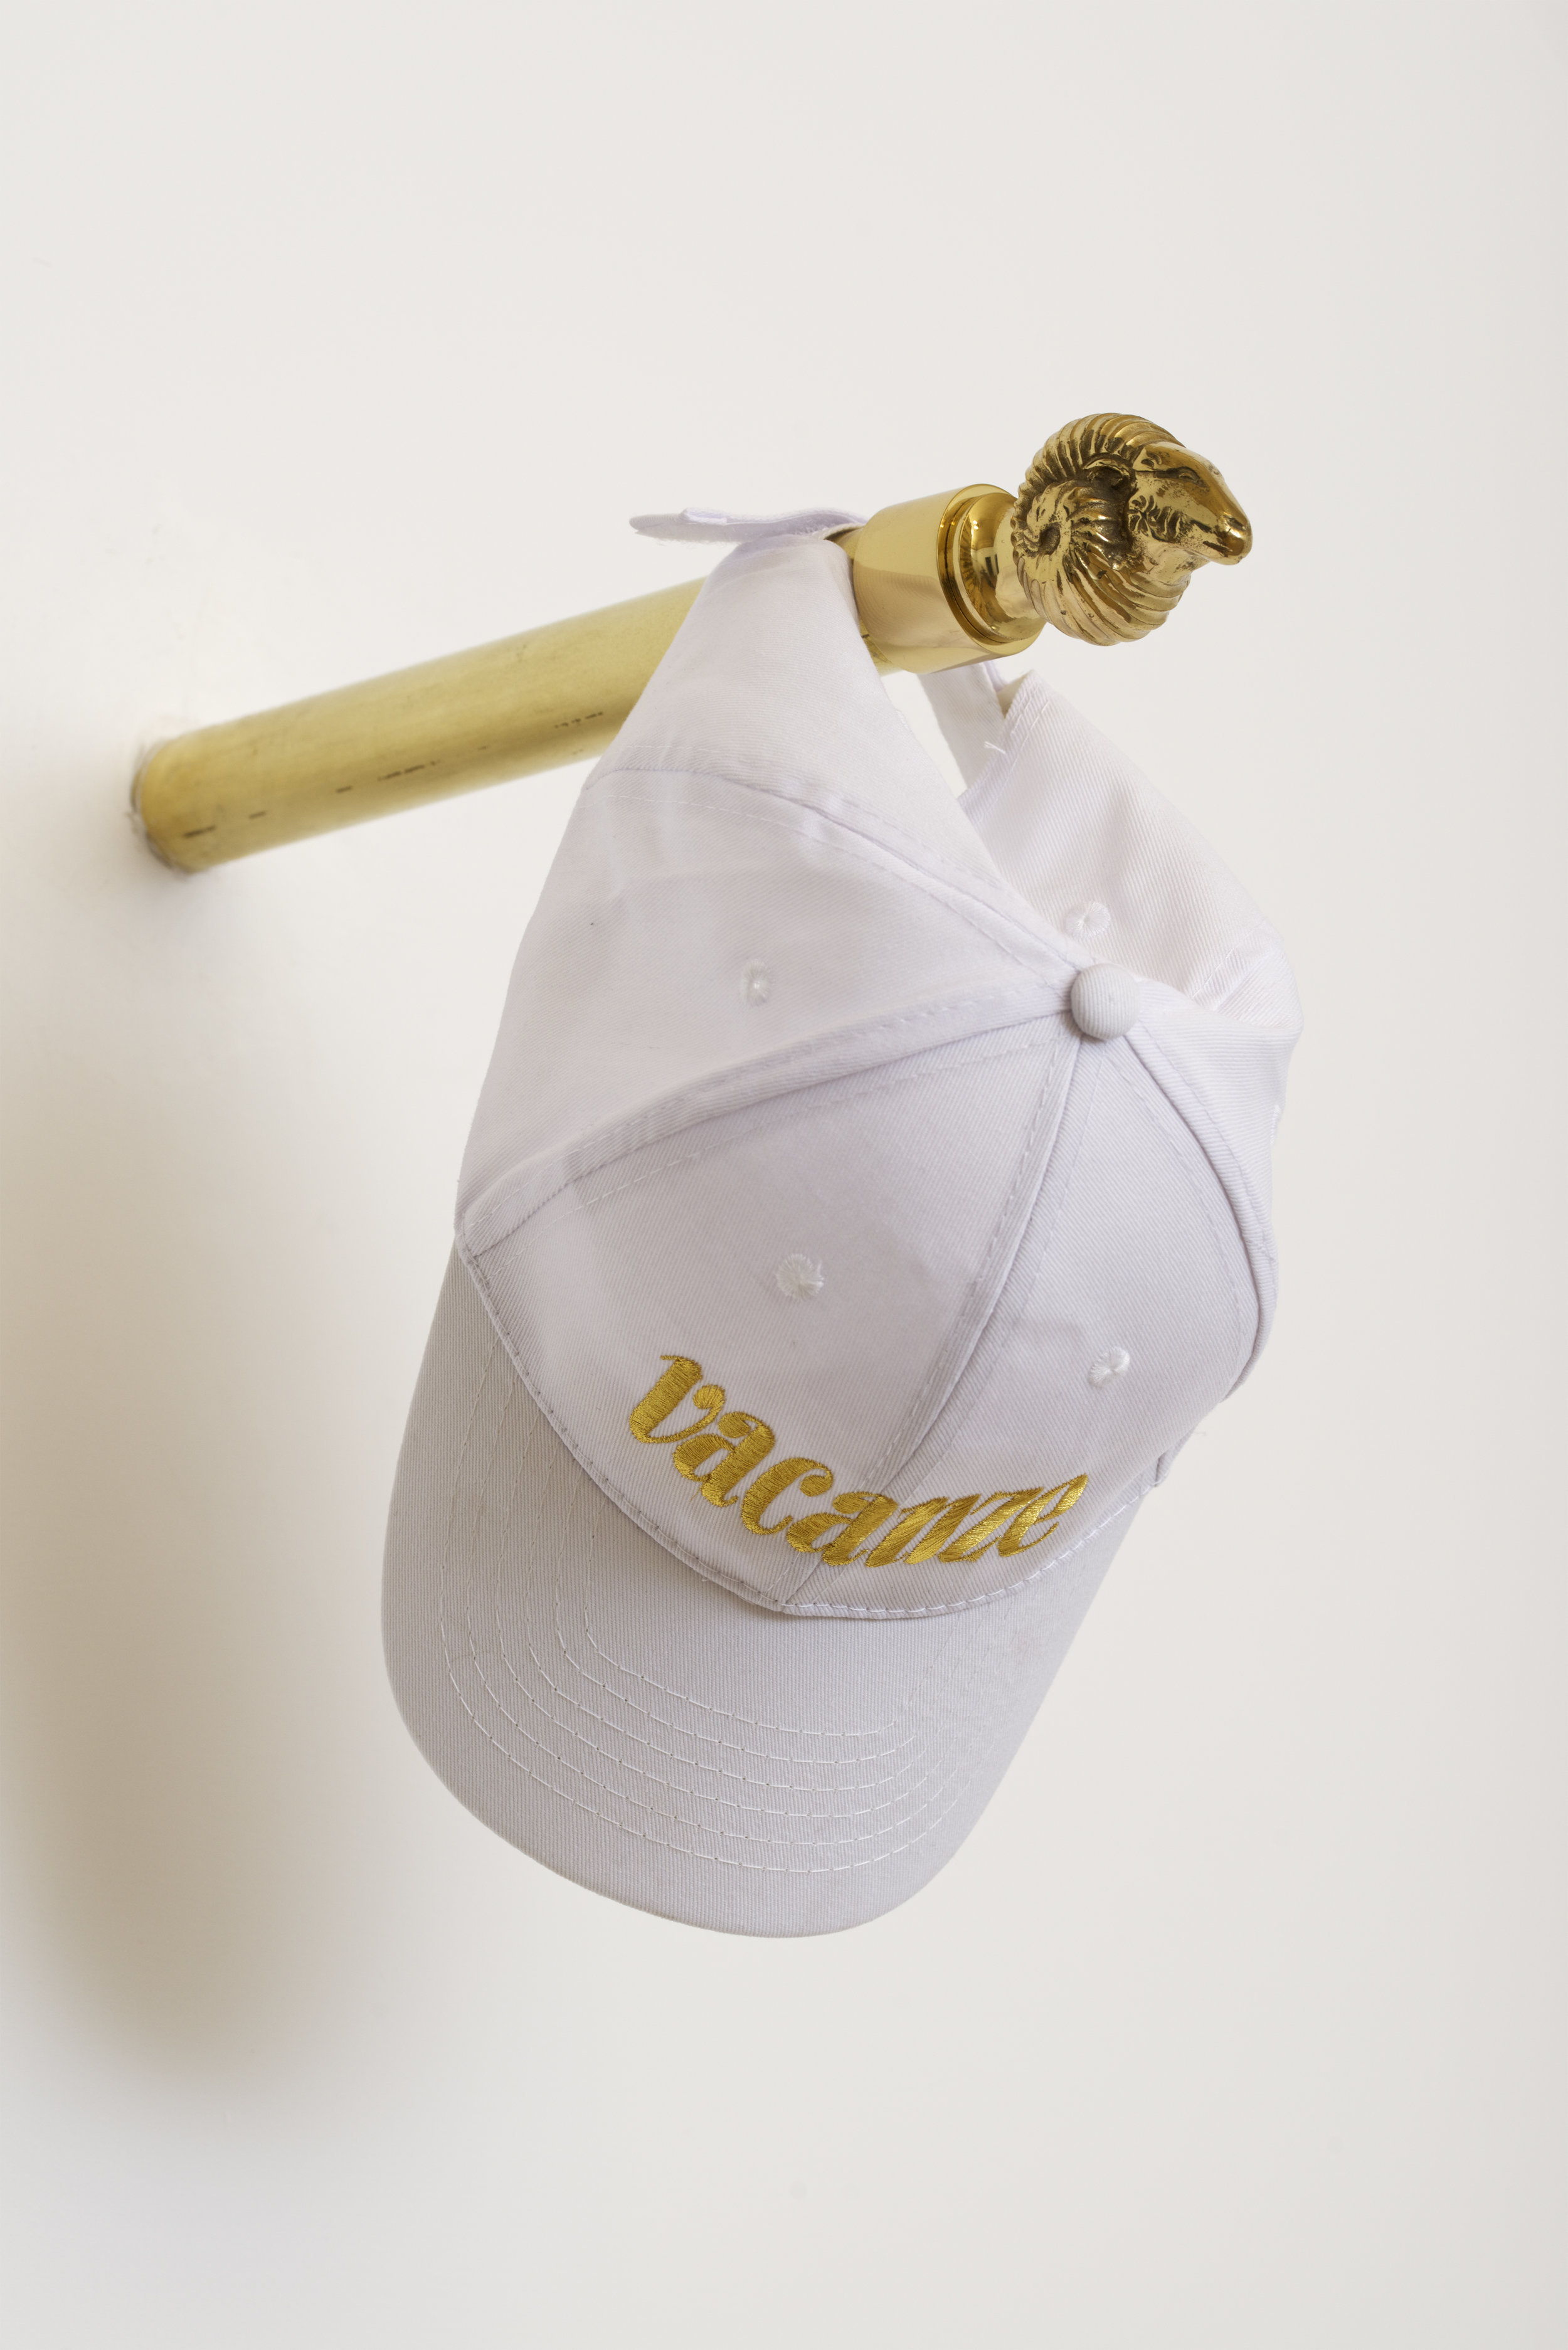 Adam Stamp,  Hanging up my hat,  2018 (detail)